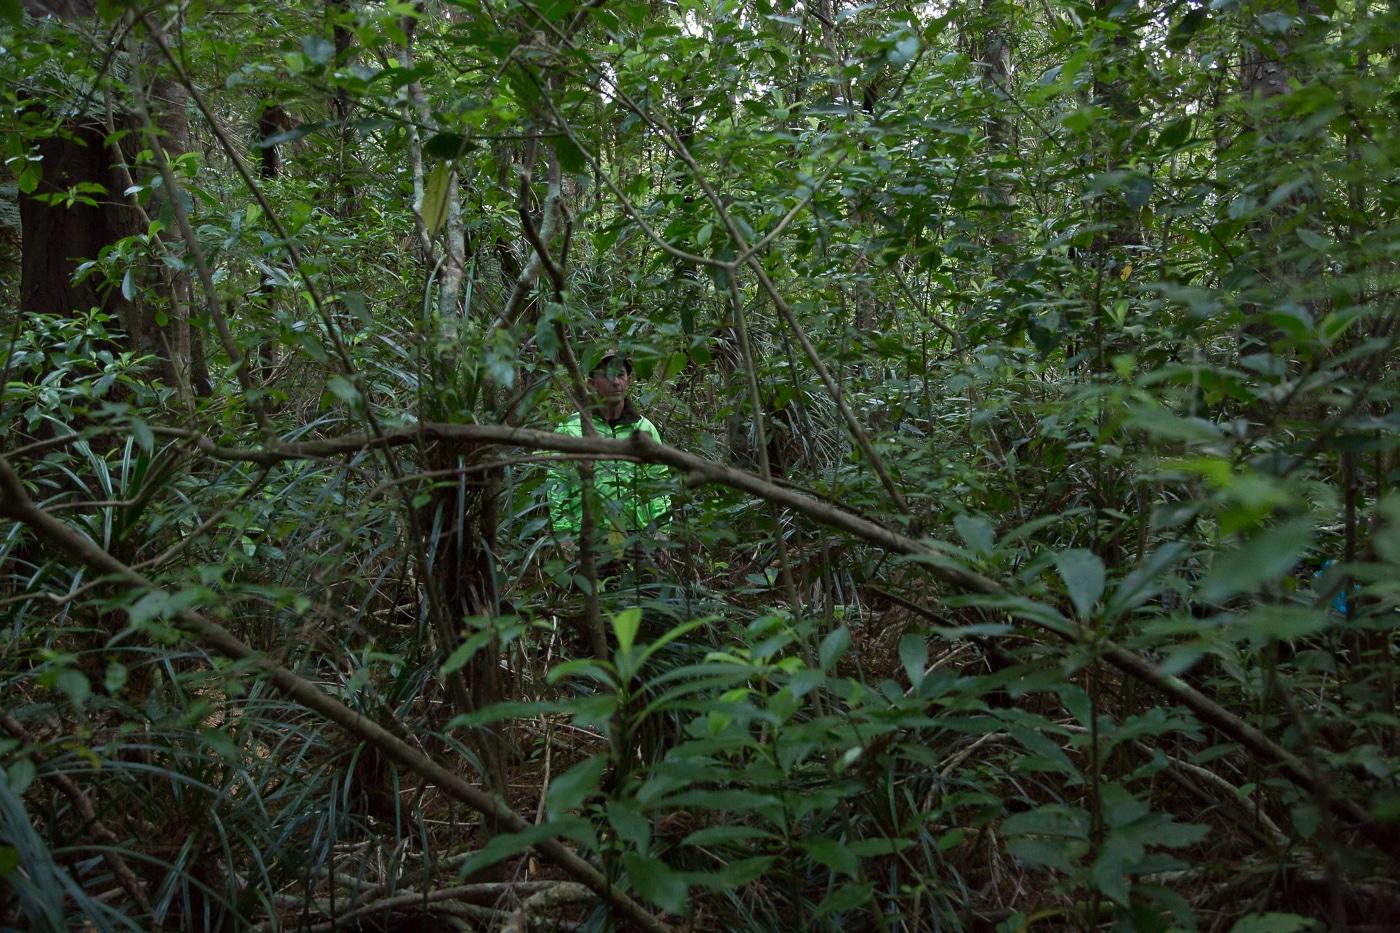 Blaze Camouflage, Blaze Camouflage – Safety while hunting